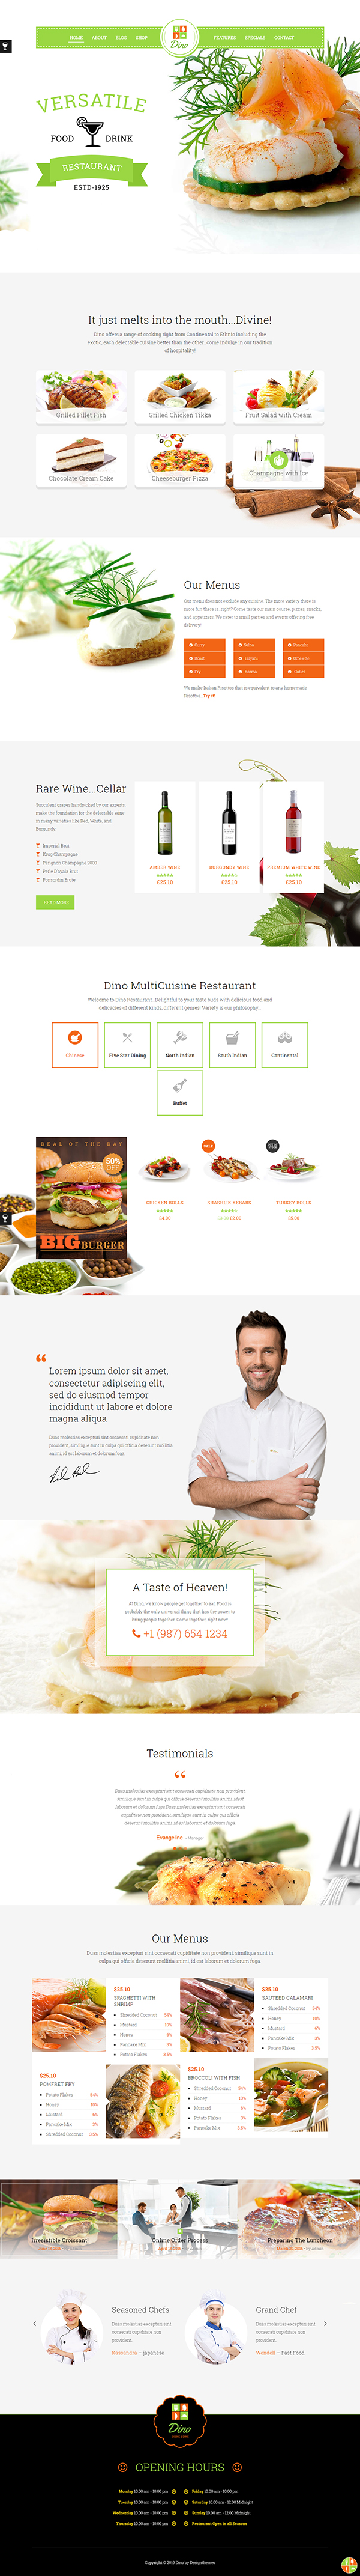 Dino - Bakery Fast Food WP Theme